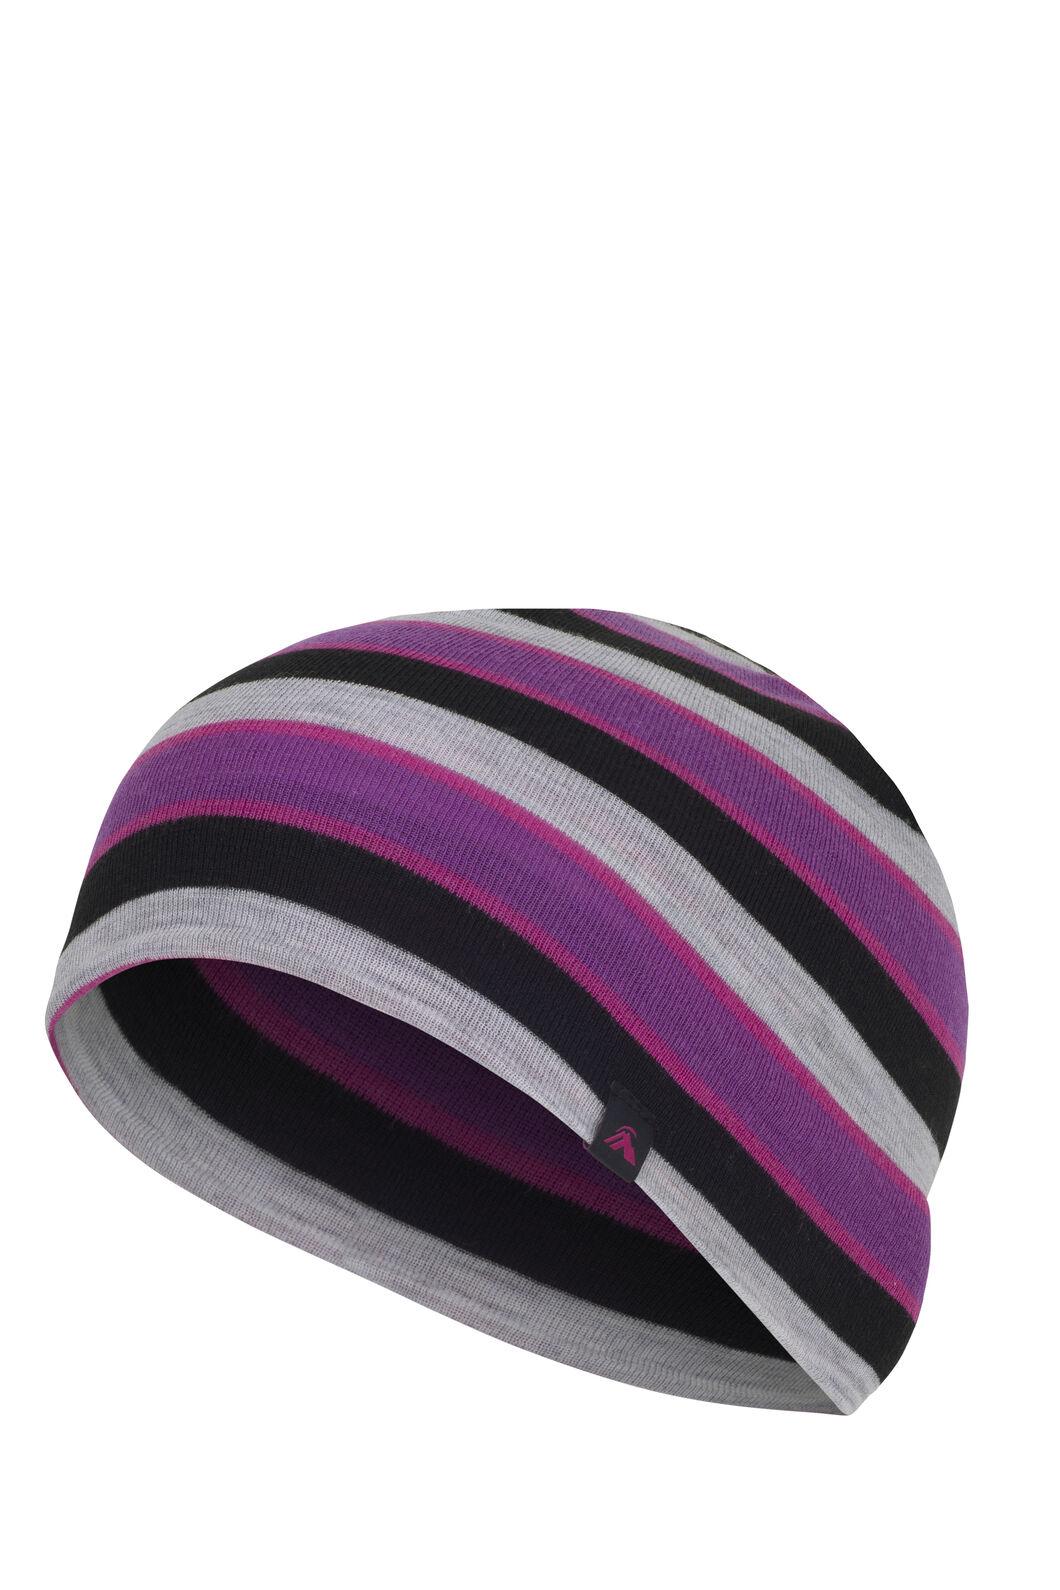 Macpac Merino 220 Beanie Kids', Purple Stripe, hi-res